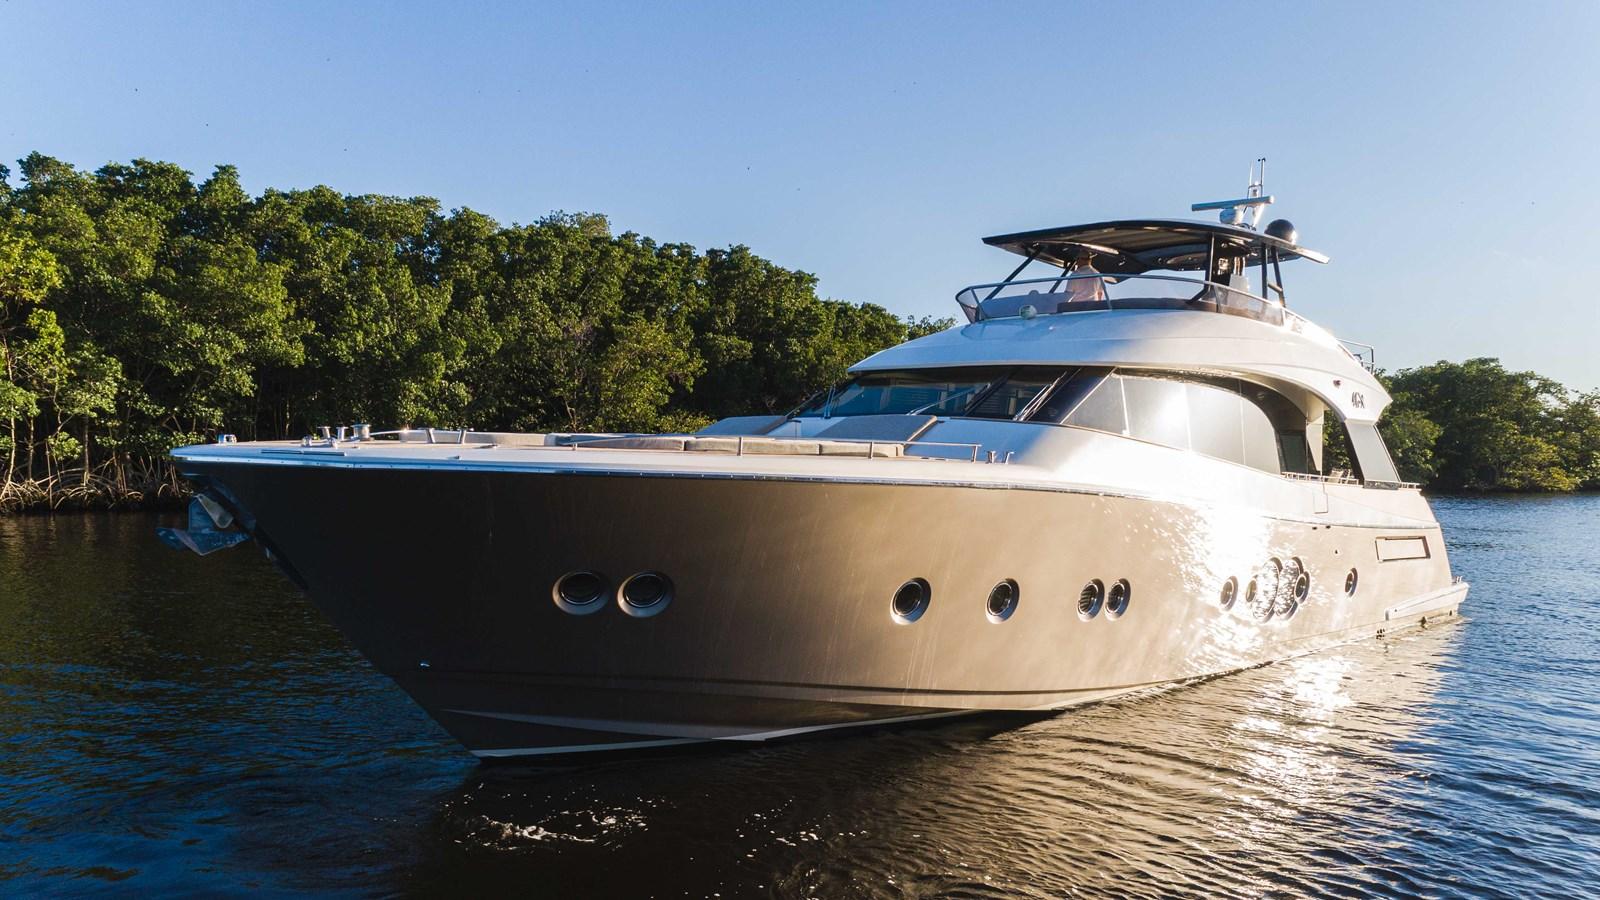 76 Monte Carlo (7 of 127) 2014 MONTE CARLO YACHTS Motoryacht Motor Yacht 2824980